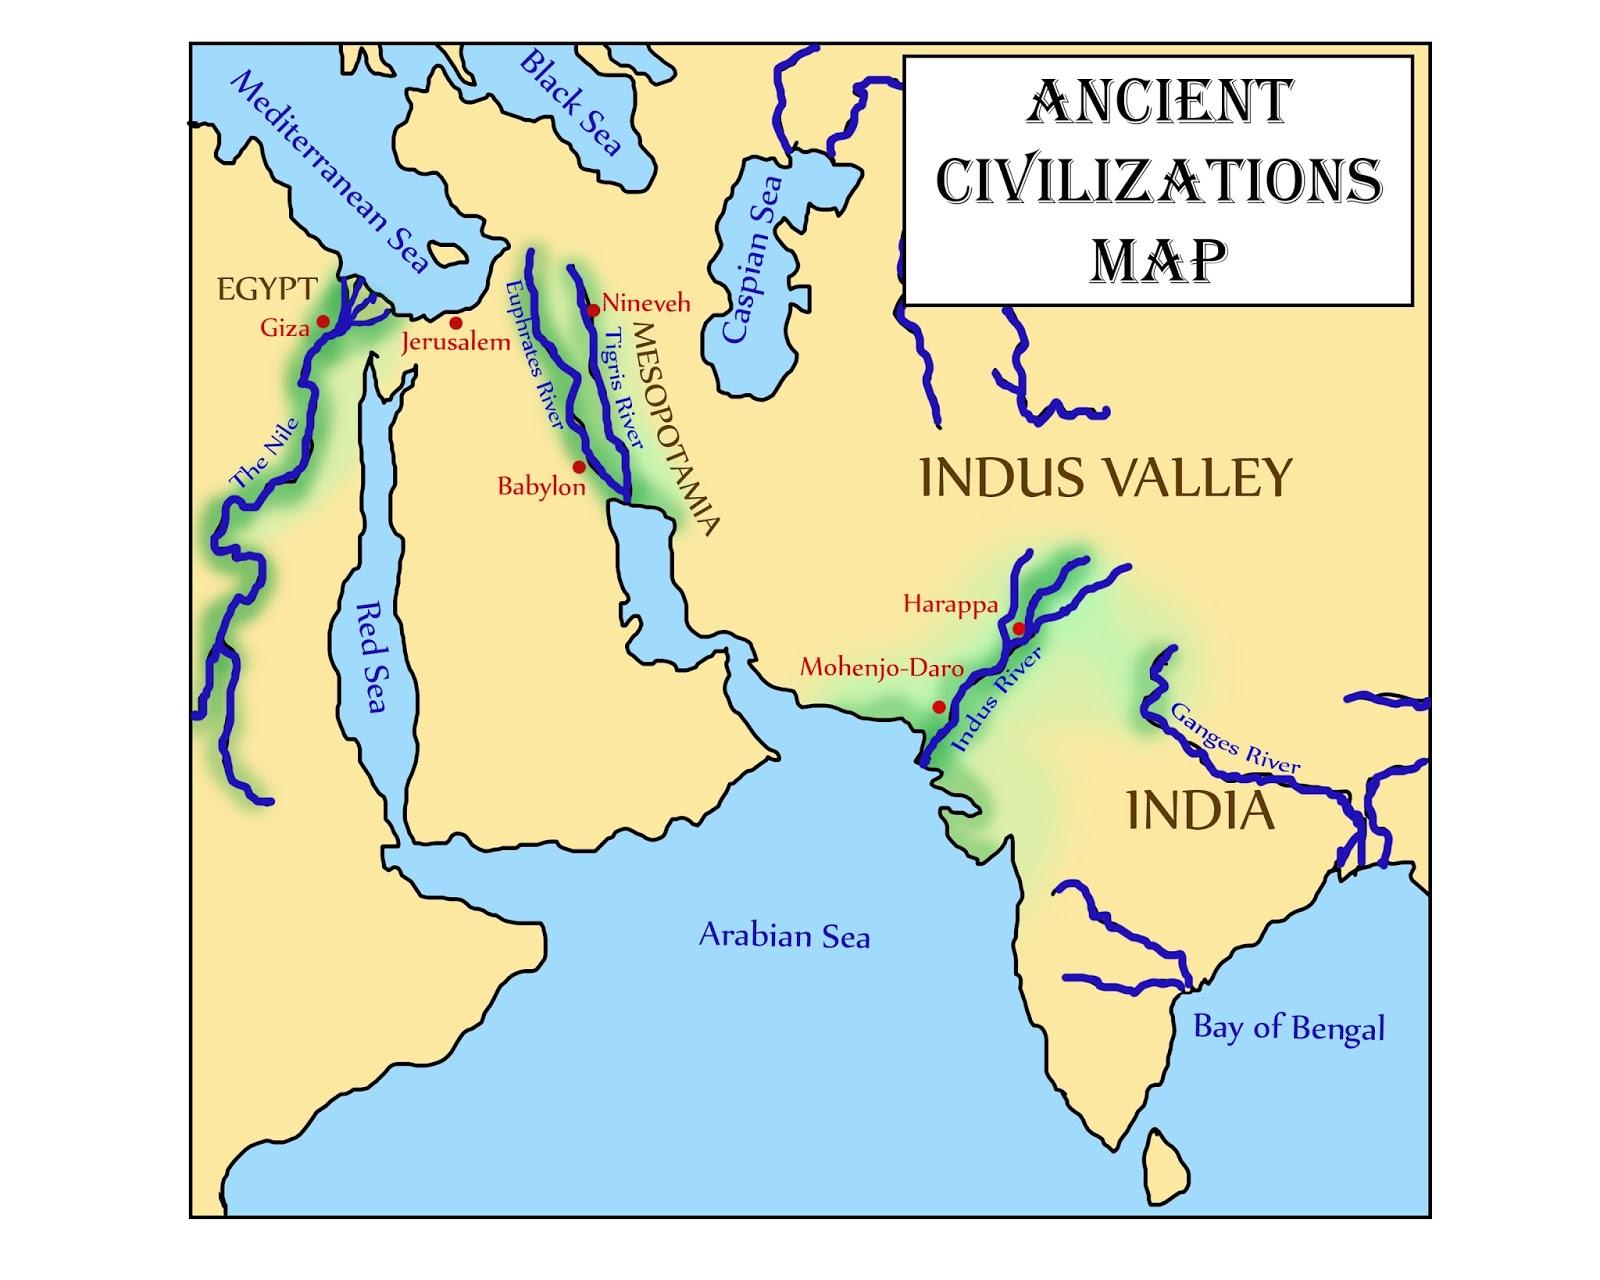 Indus River Valley Civilization Map Worksheet   Printable Worksheets on krishna map, south china sea map, indian ocean map, yellow river map, mekong map, thar desert map, india map, arabian sea map, harappa map, himalayas map, himalayan mountains map, yellow sea map, ganges map, huang he map, sea of japan map, danube river map, hindu kush map, caucasus mountains map, congo river map, gobi desert map,